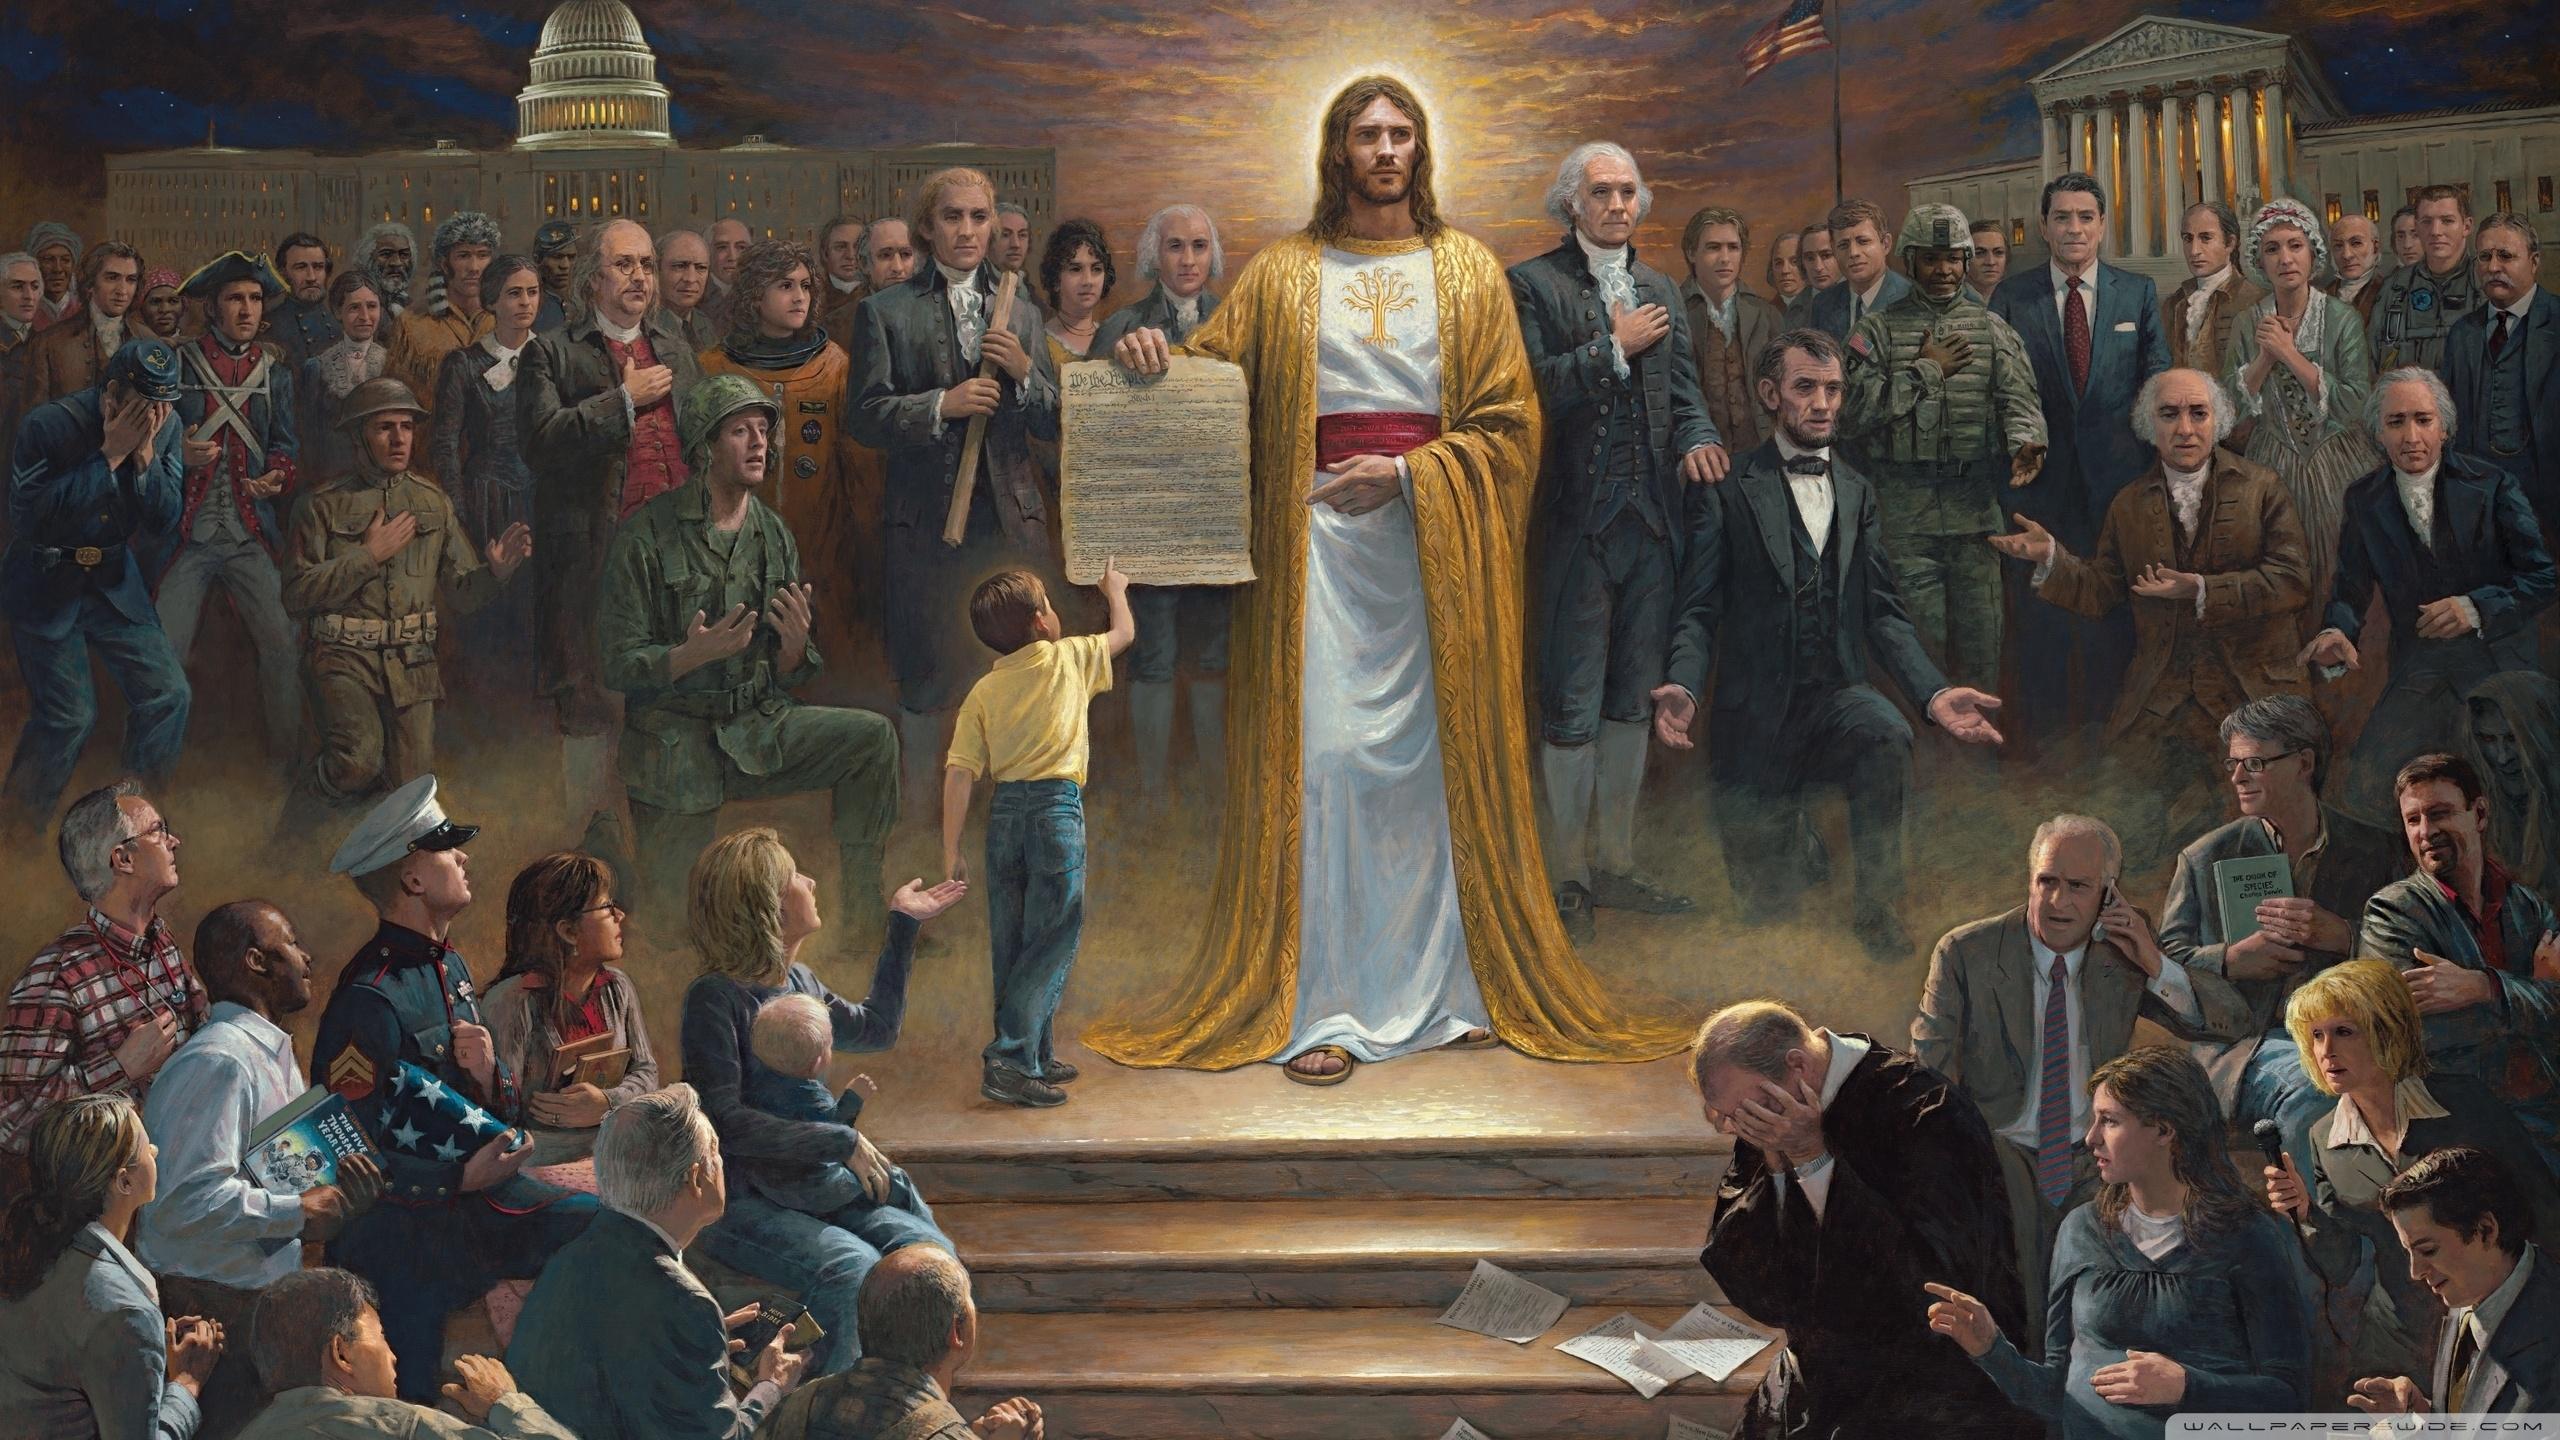 Jesus Founding Fathers wallpaper   1439106 2560x1440